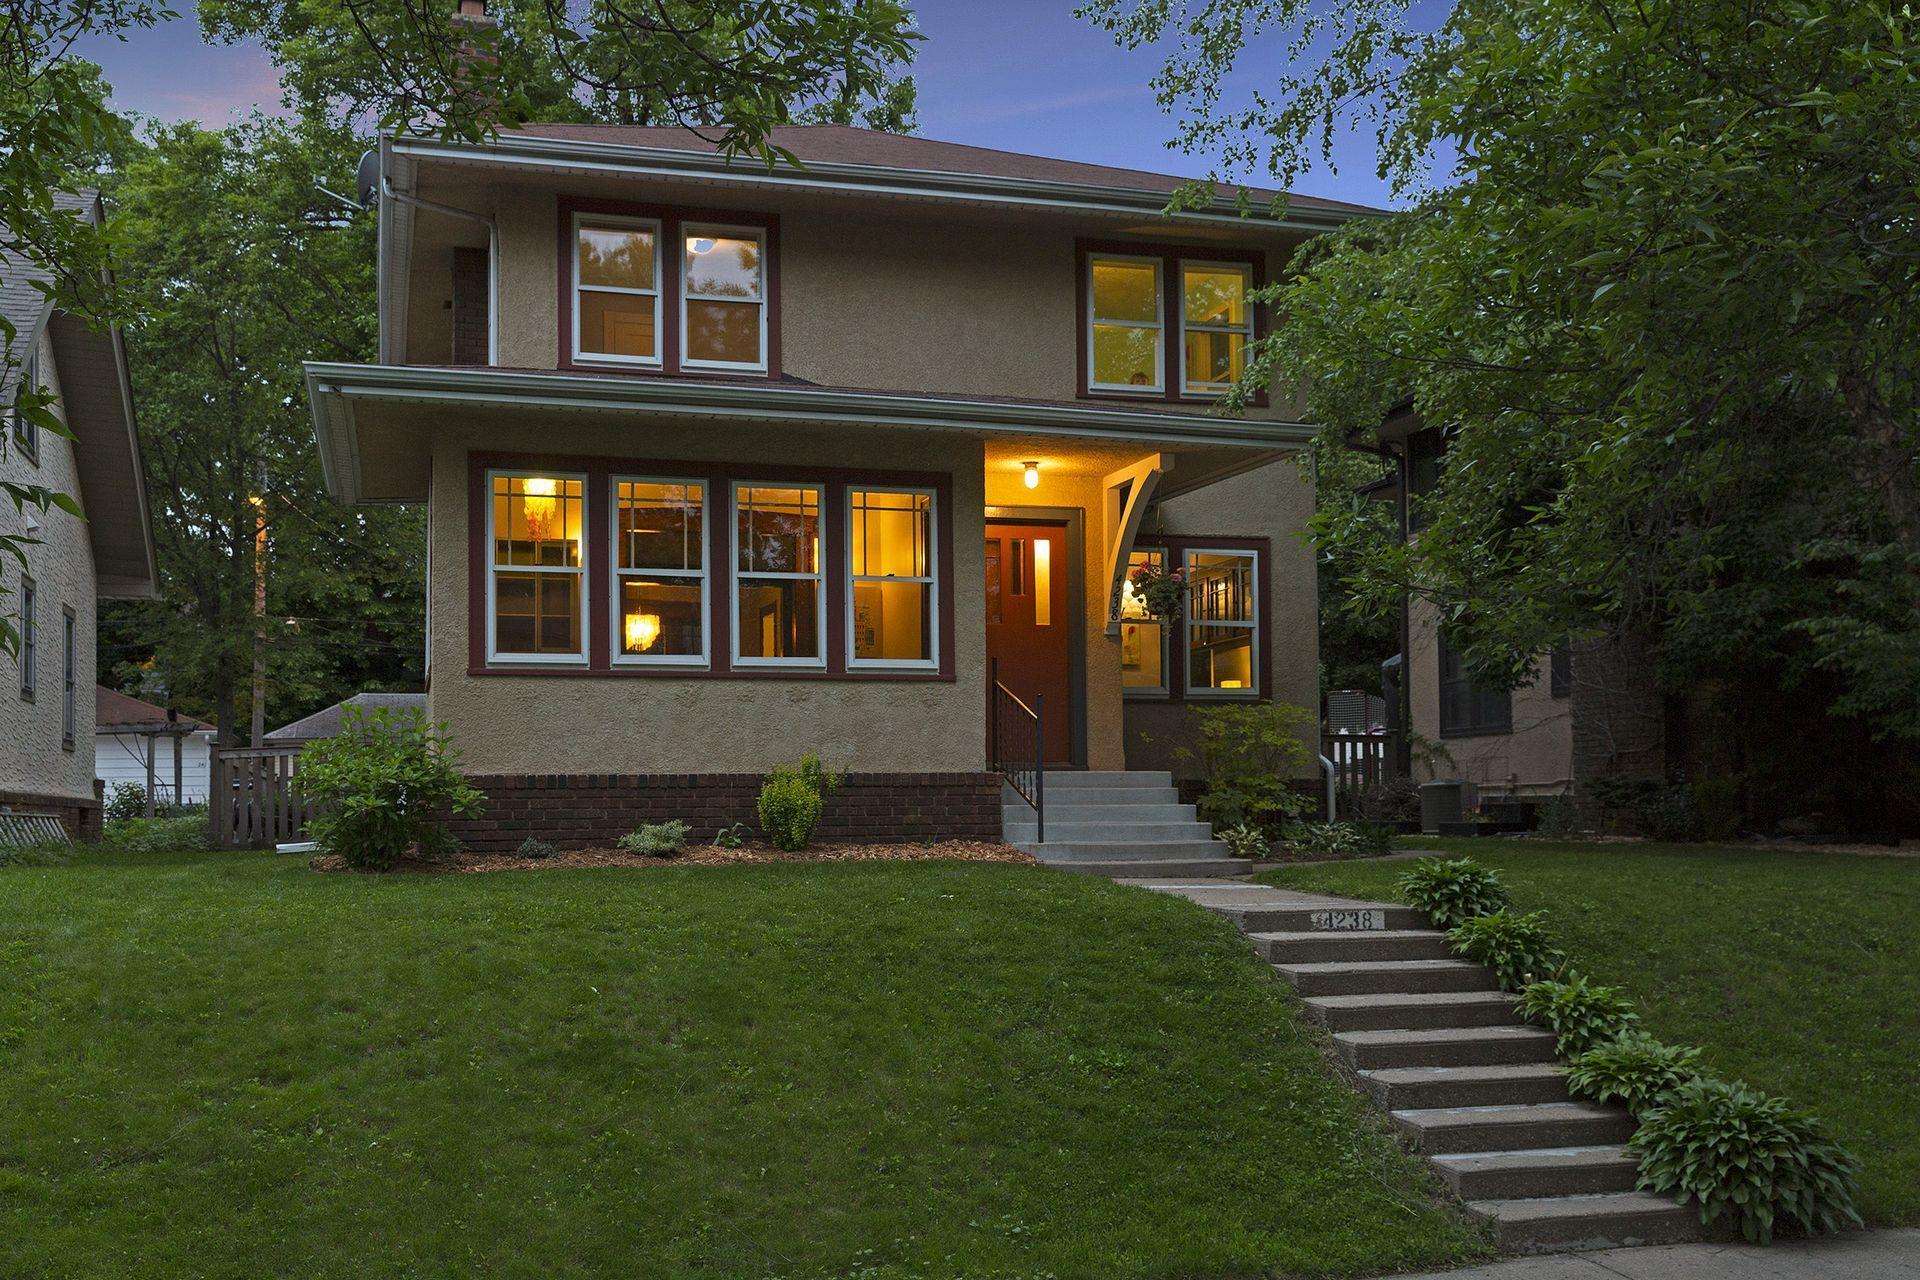 4238 Grand S Property Photo - Minneapolis, MN real estate listing